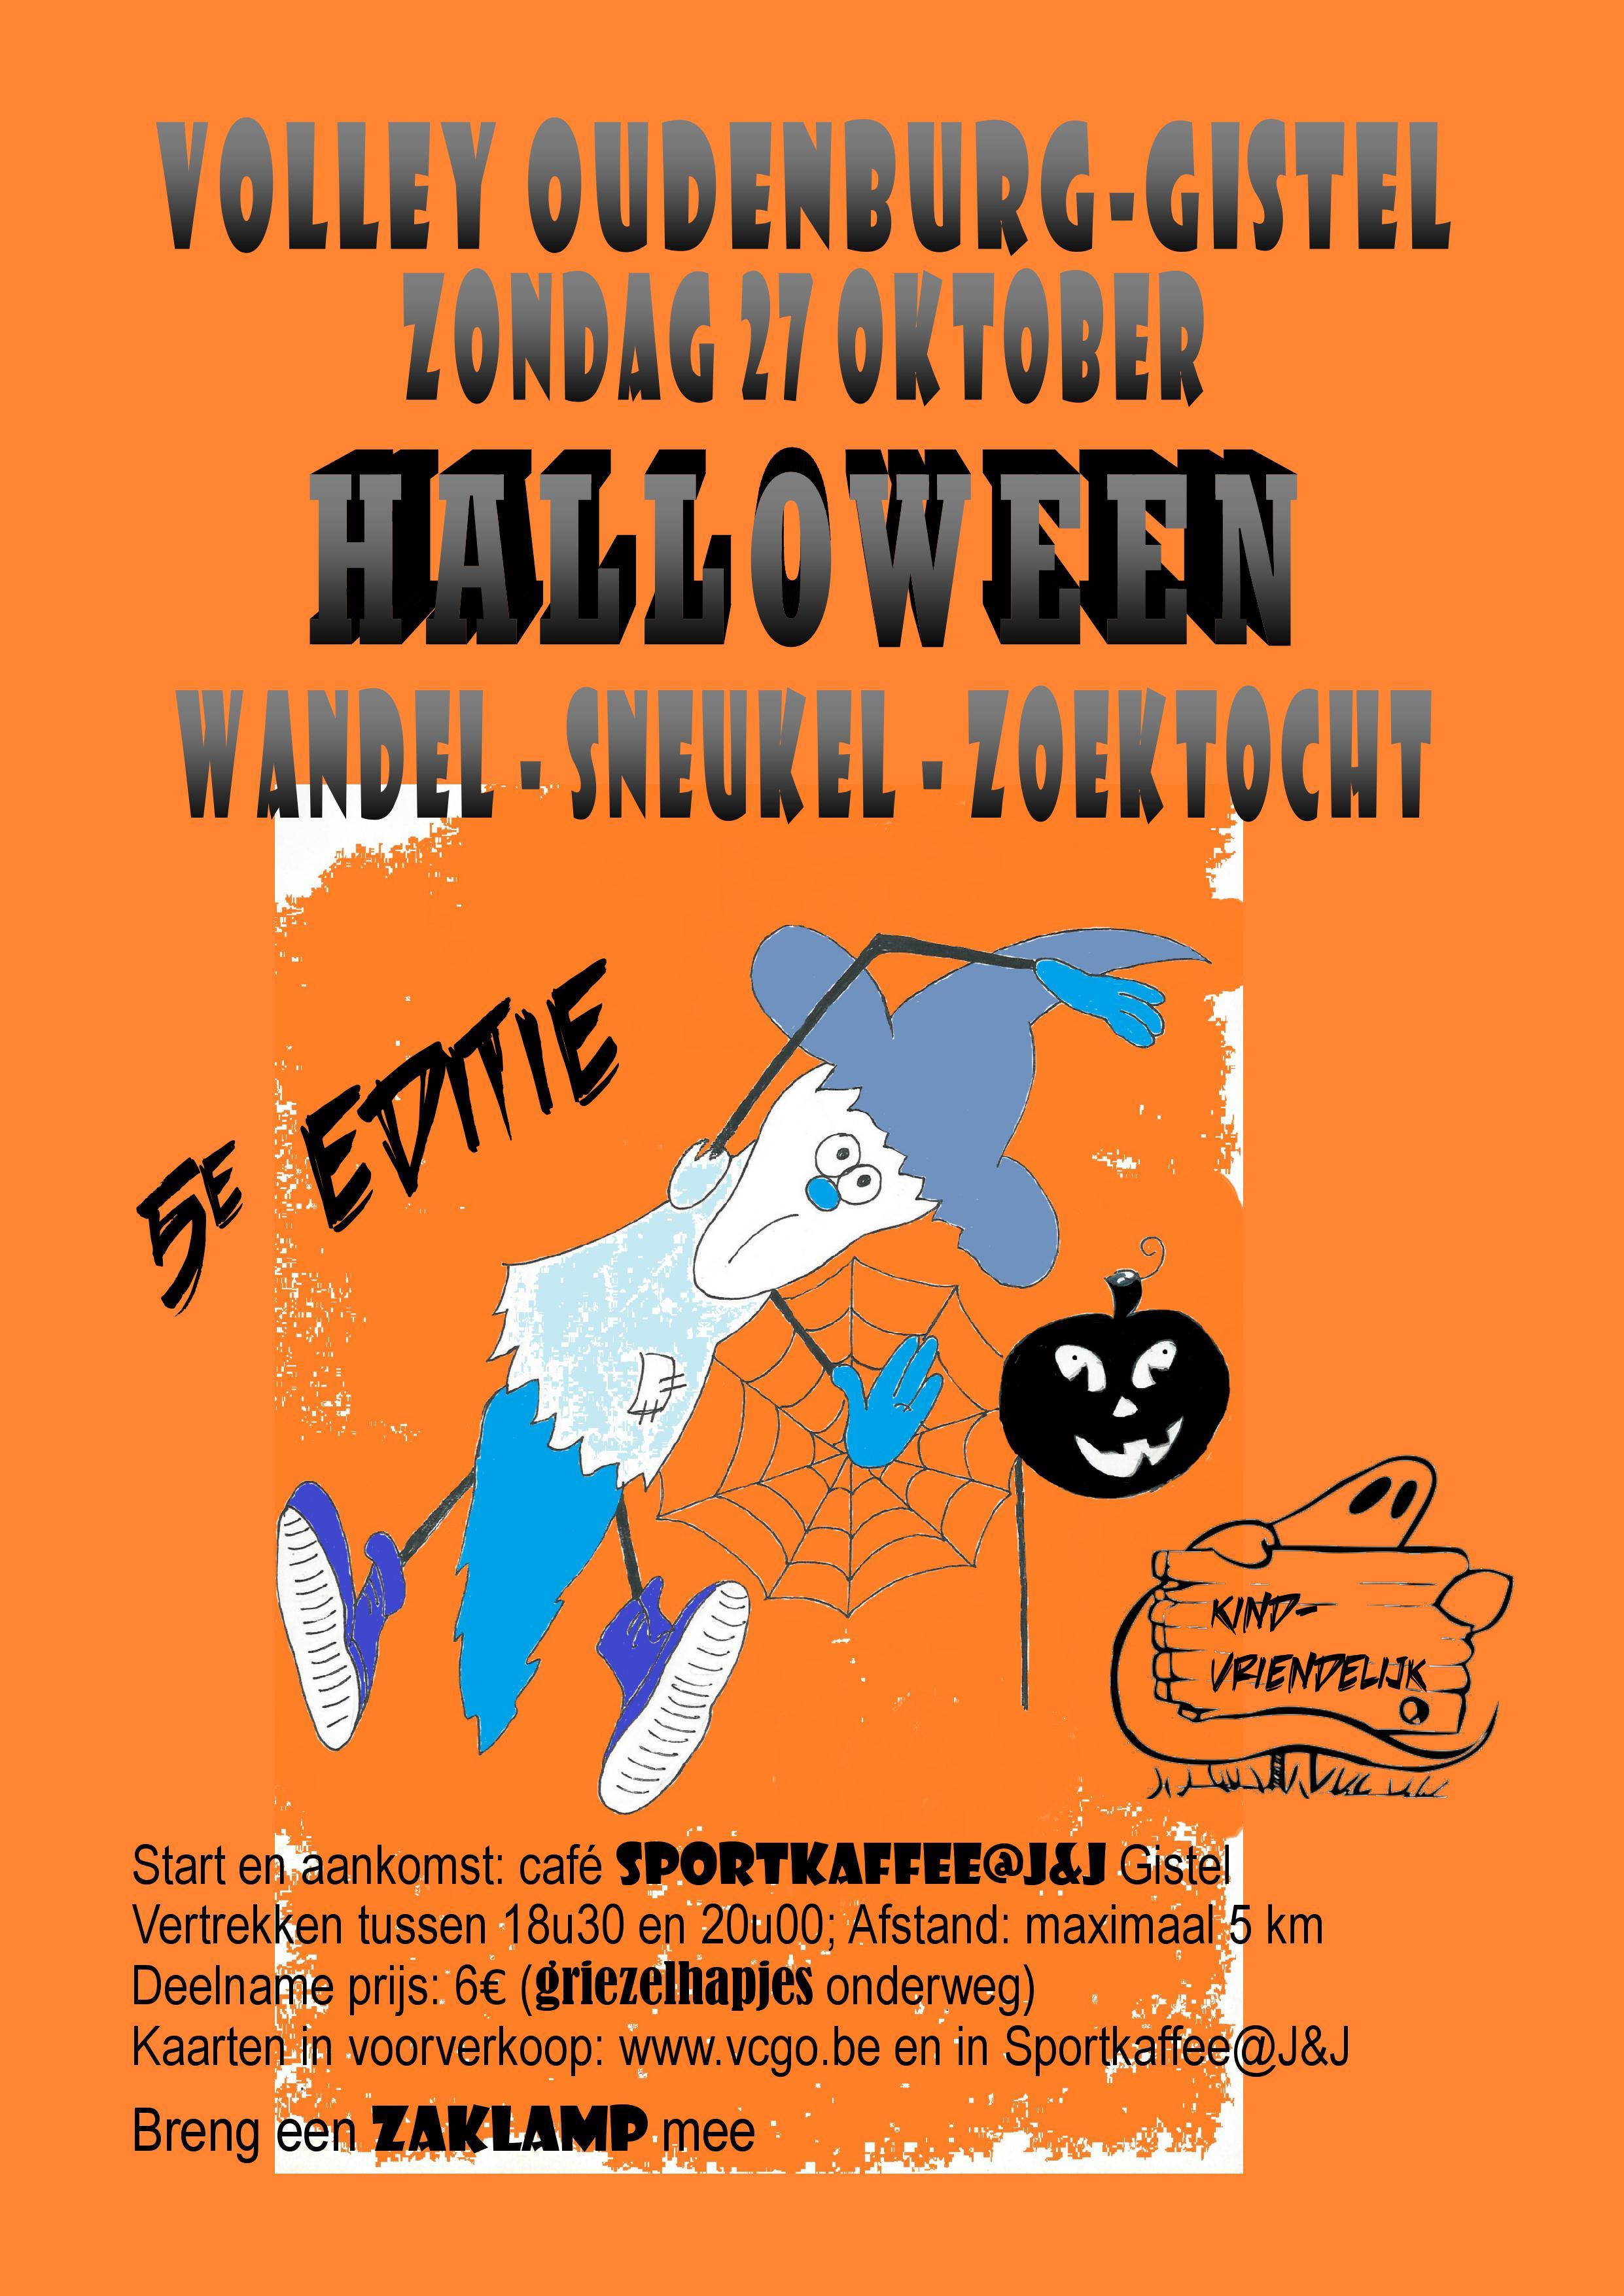 Halloweentocht 2019